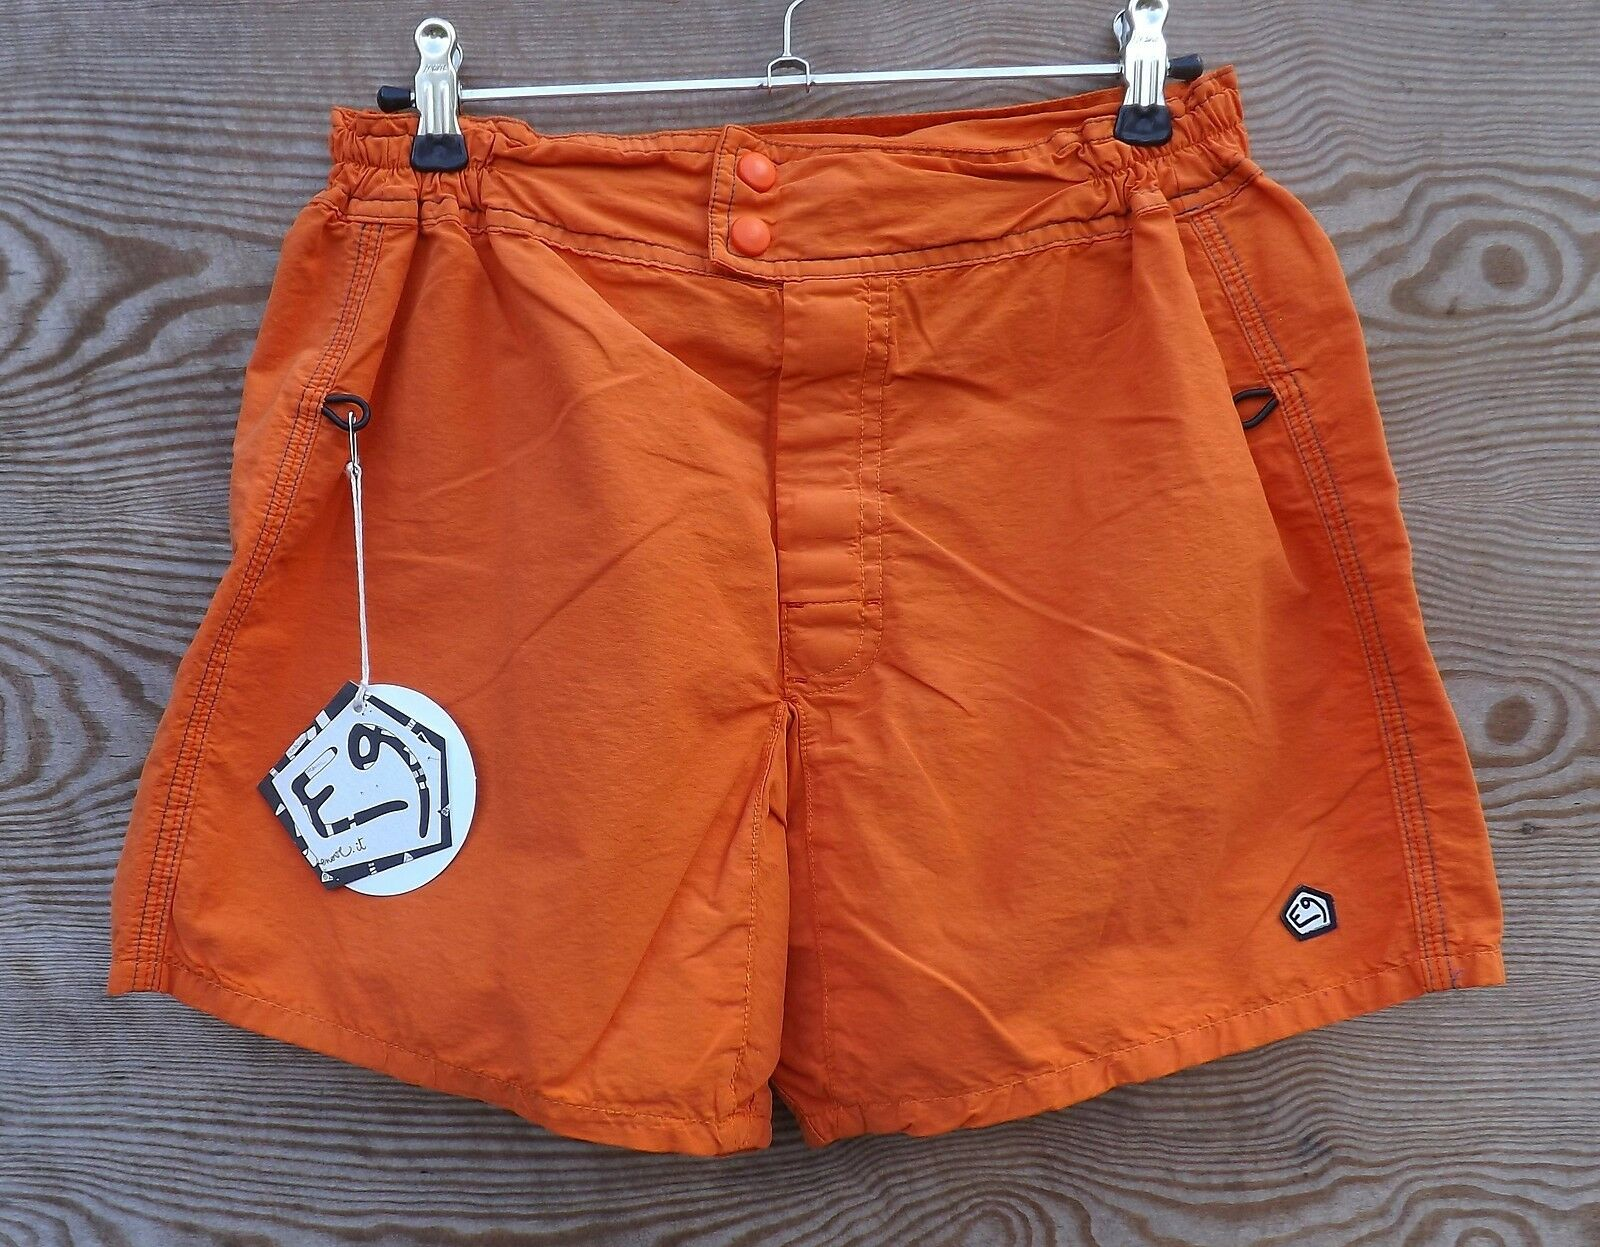 E9 DWS Shorts for Men, Swim Shorts - Deep Water  Soloing Climbing Shorts  save 50%-75%off